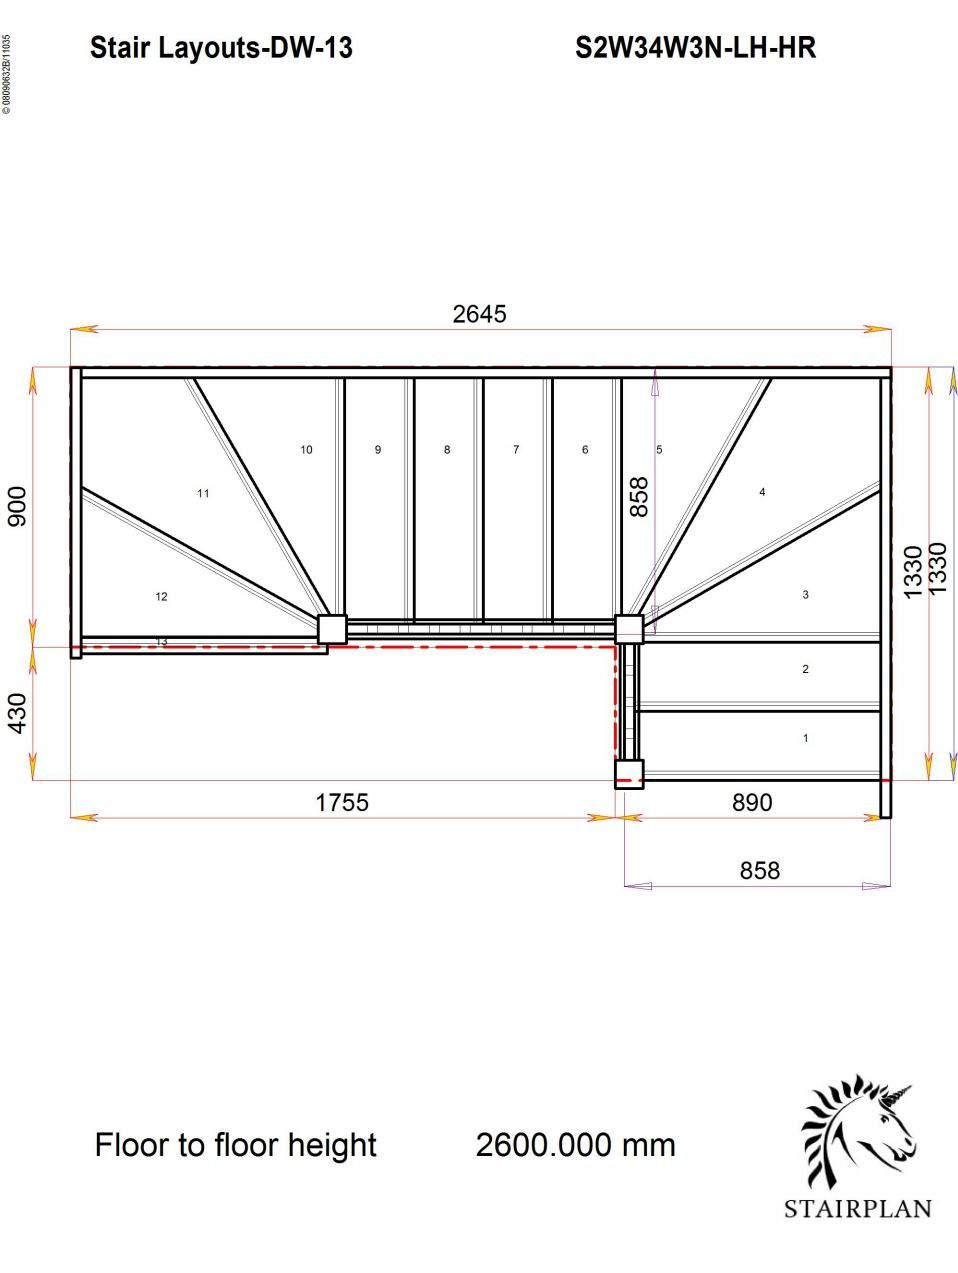 Stair calculator winders - Tradestairs Lh Double Winder Hr